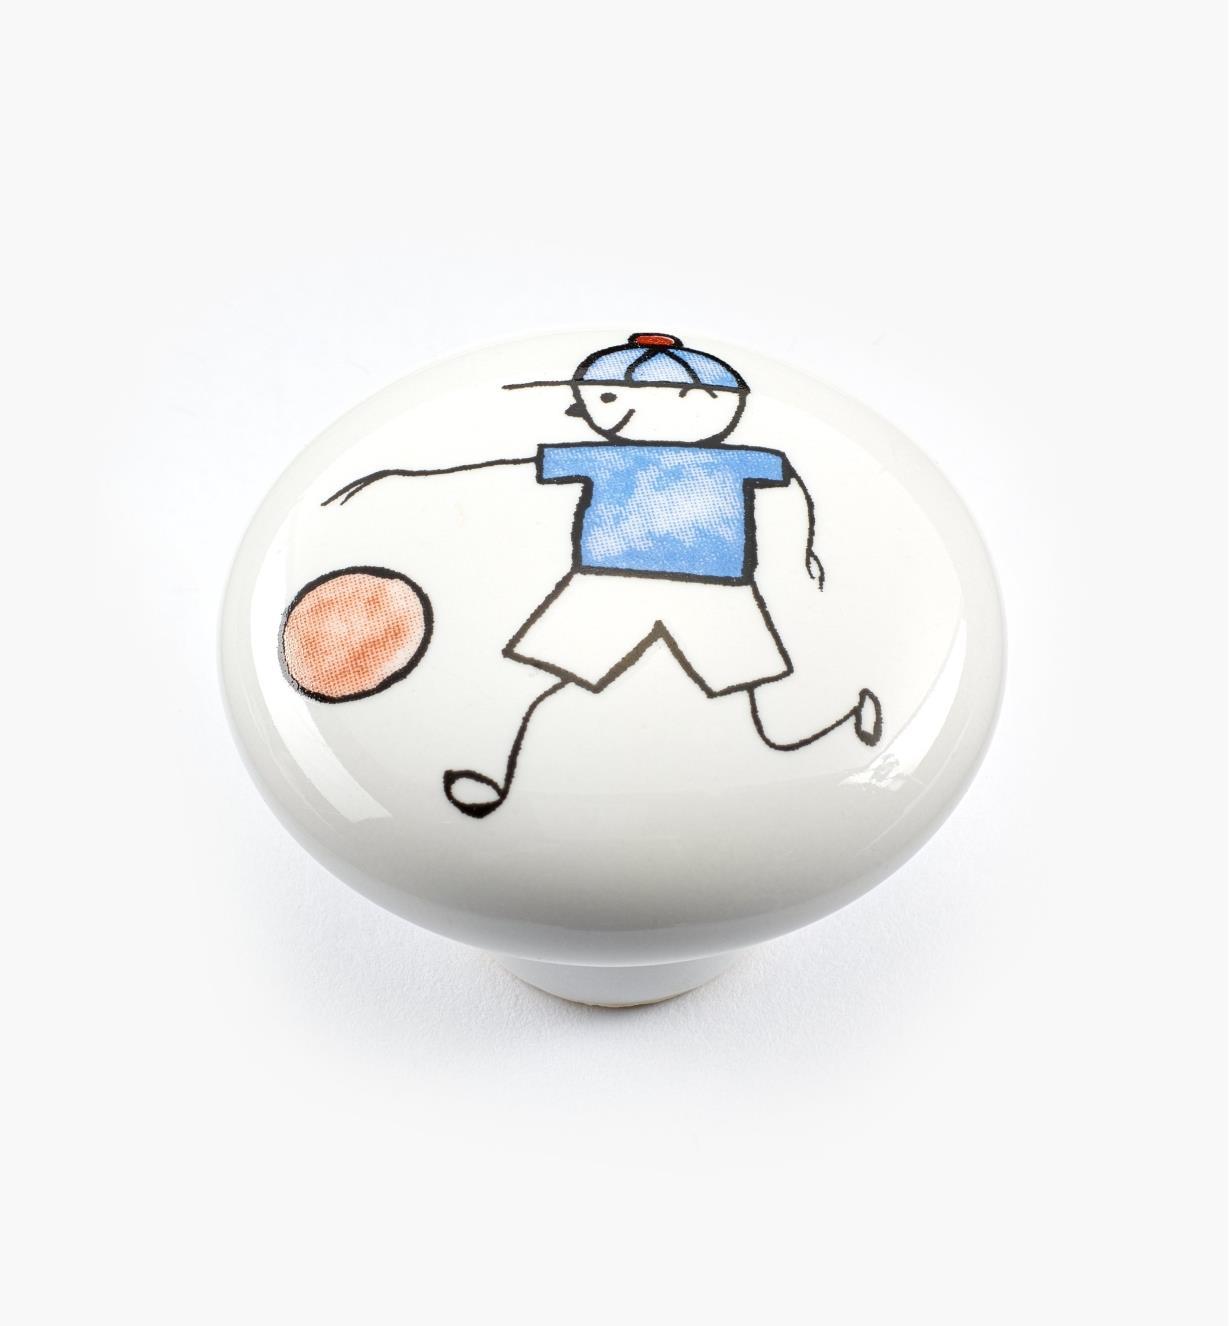 00W5312 - Basketball Knob